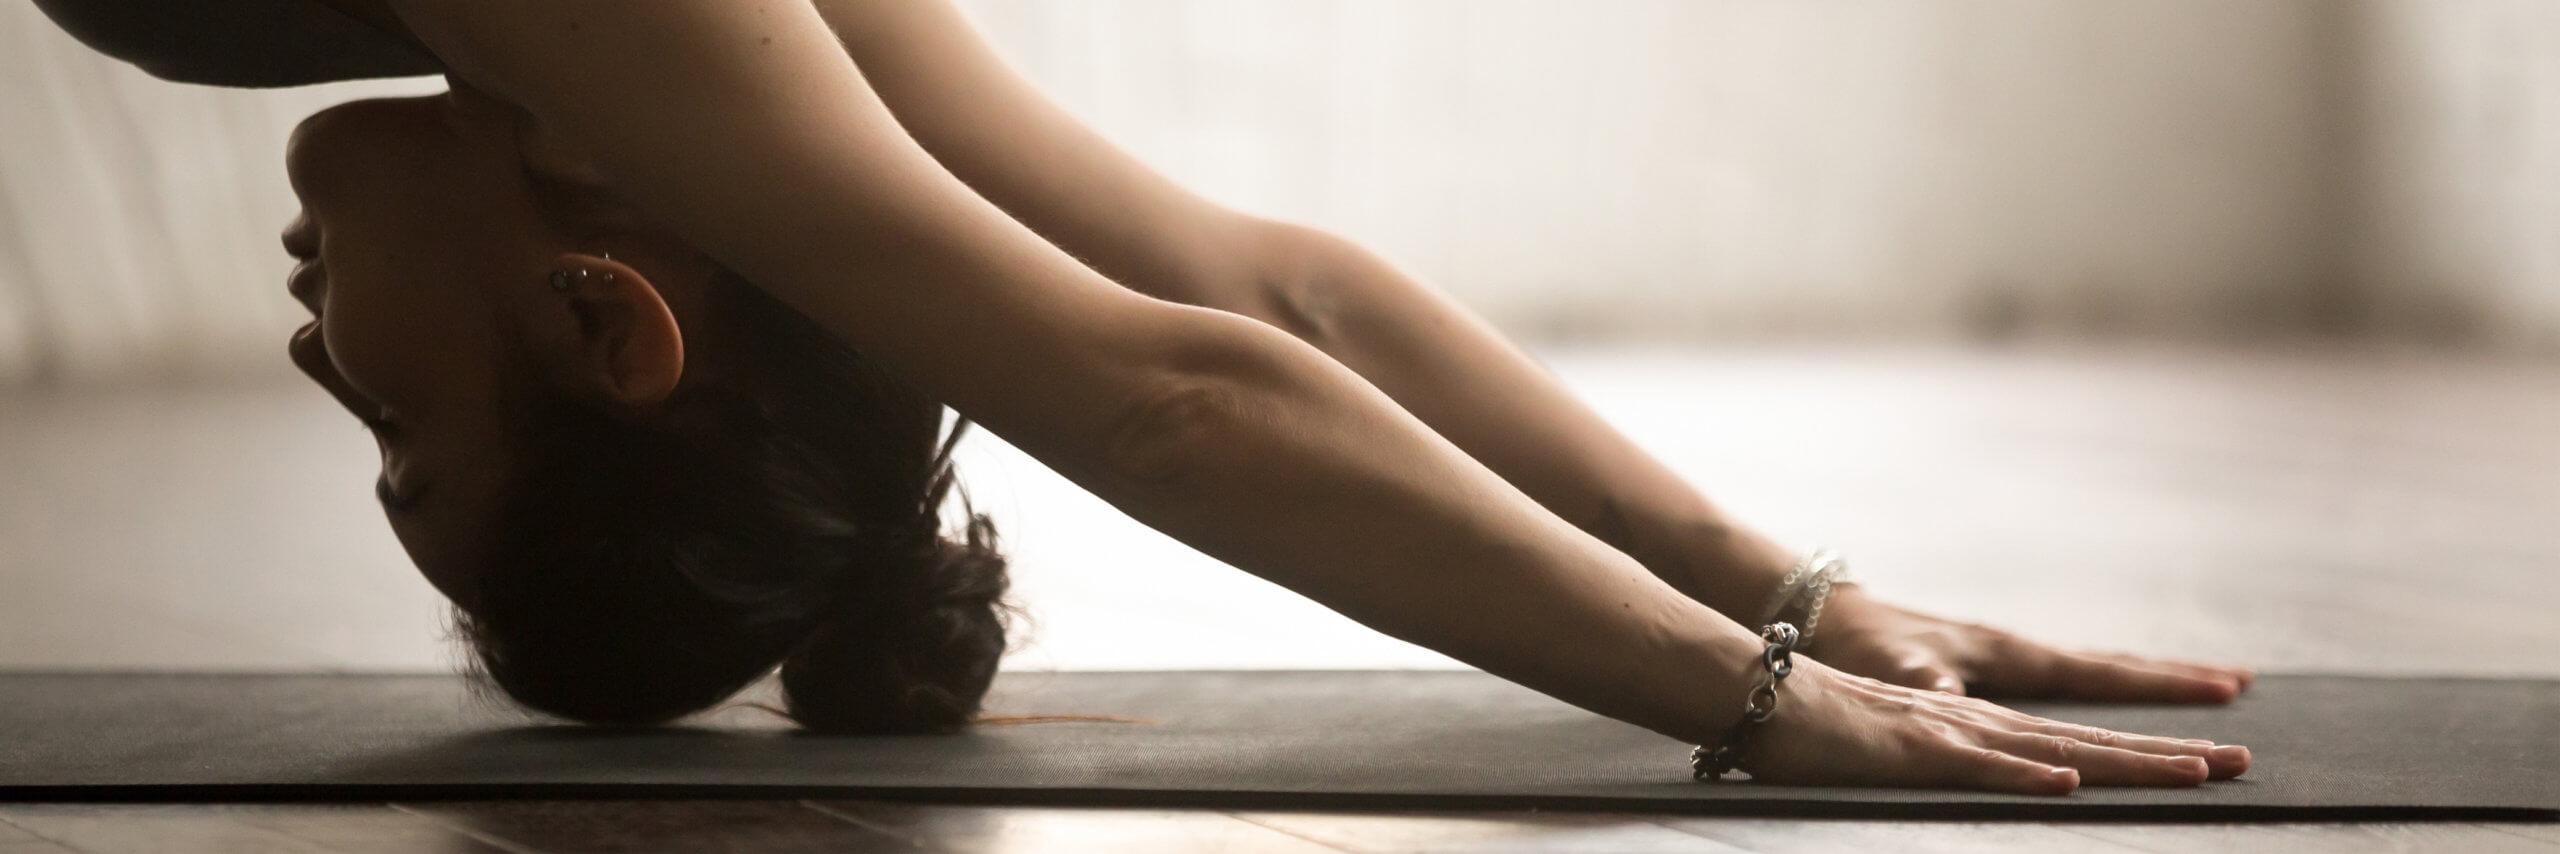 Horizontal photo sportive woman practice yoga doing downward facing dog